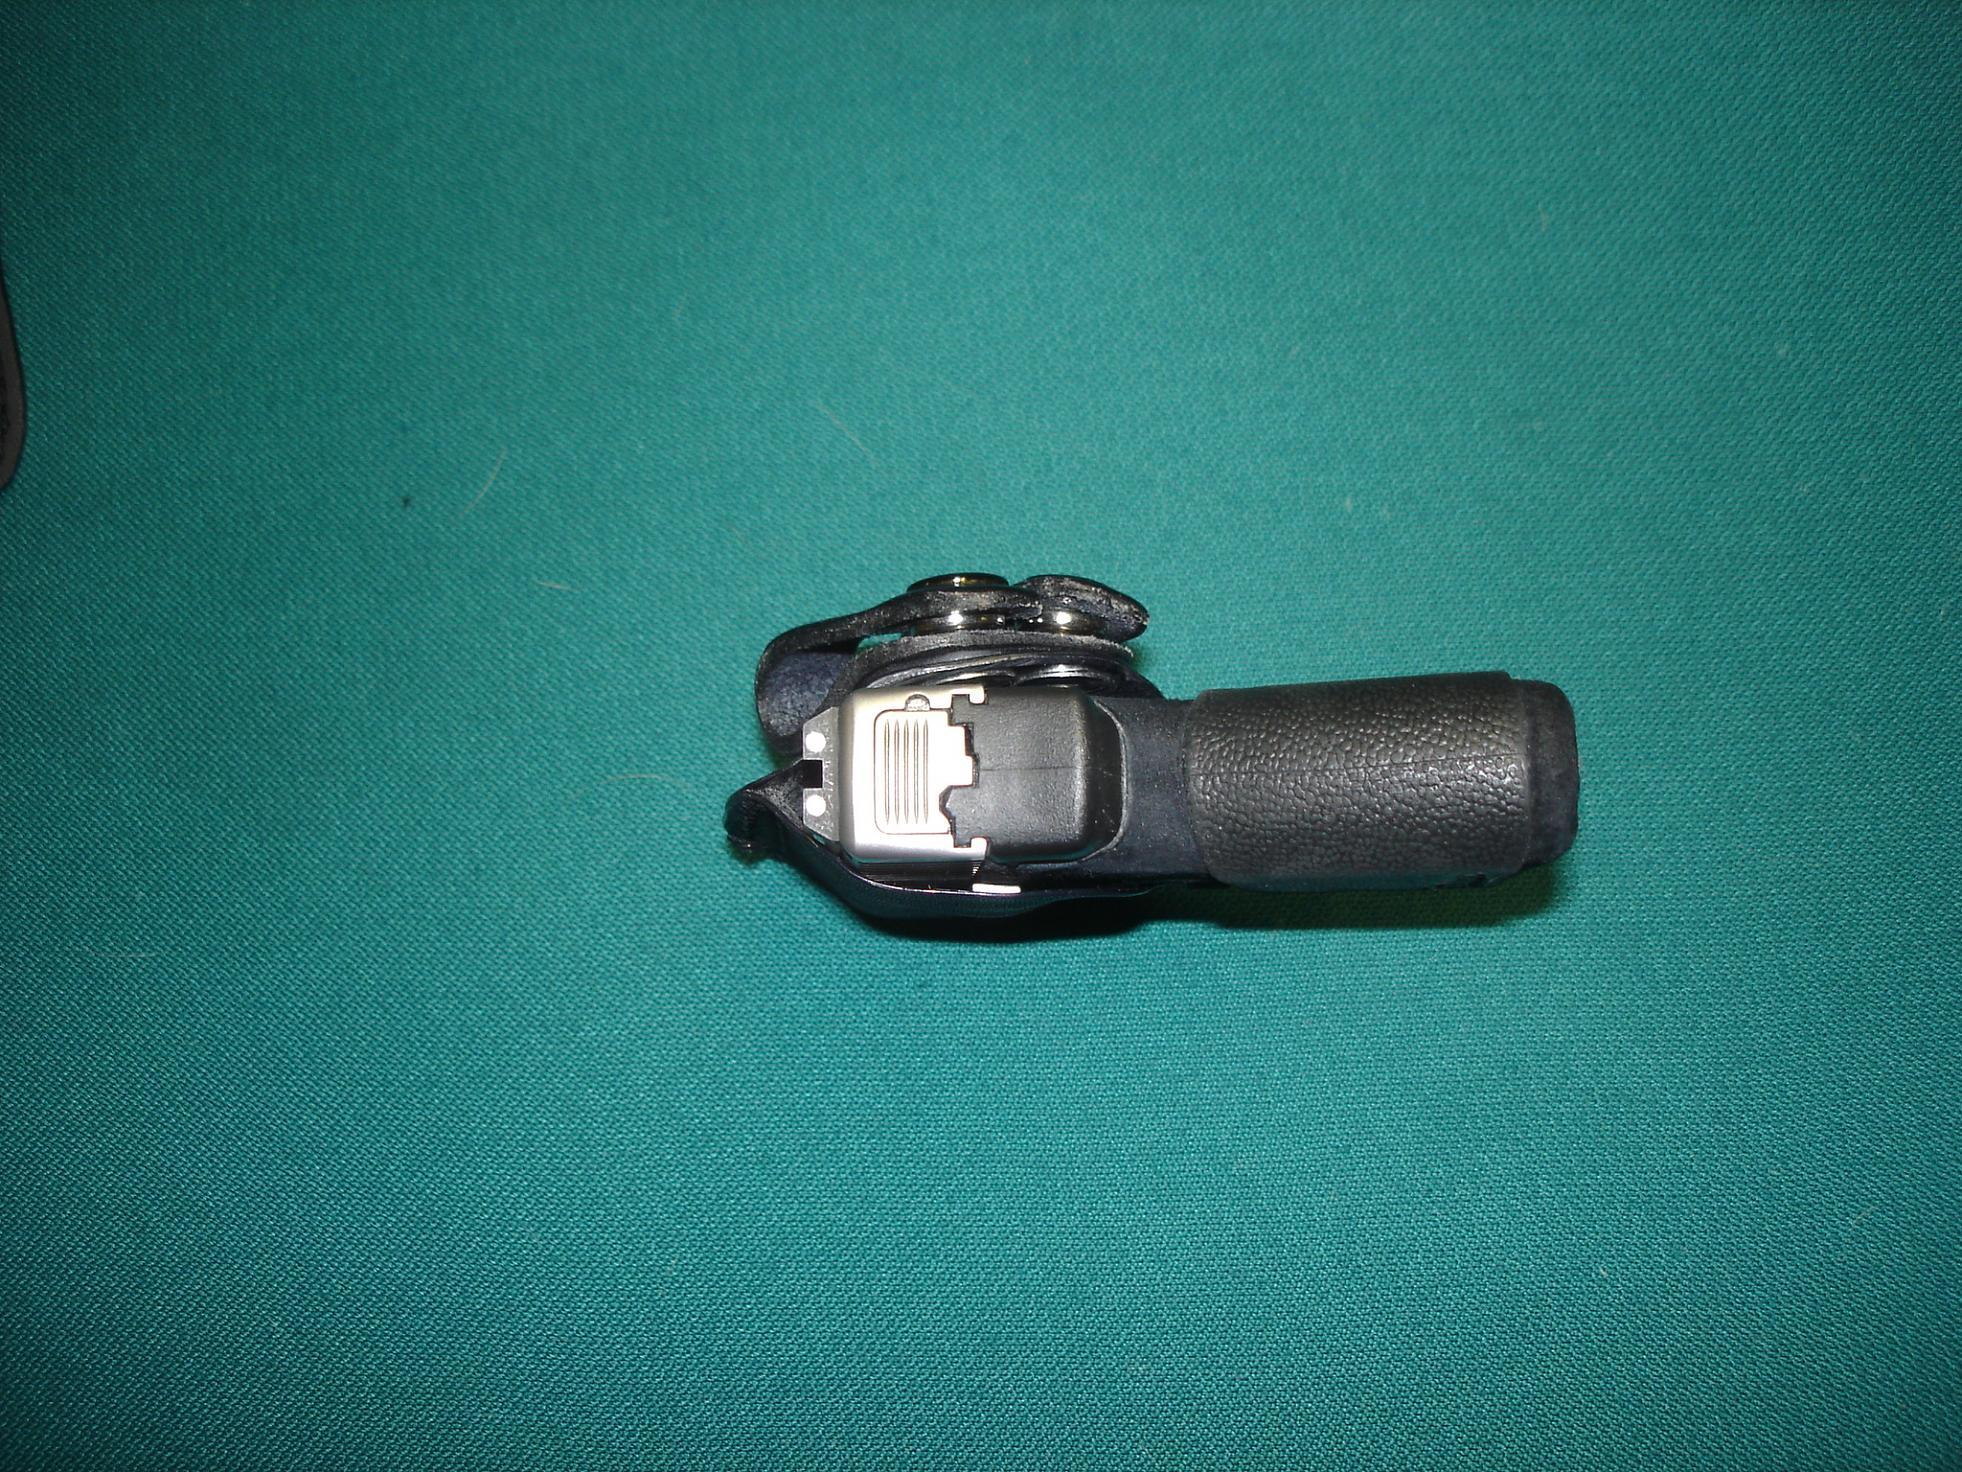 FIST kydex pocket holsters.-dsc00107.jpg